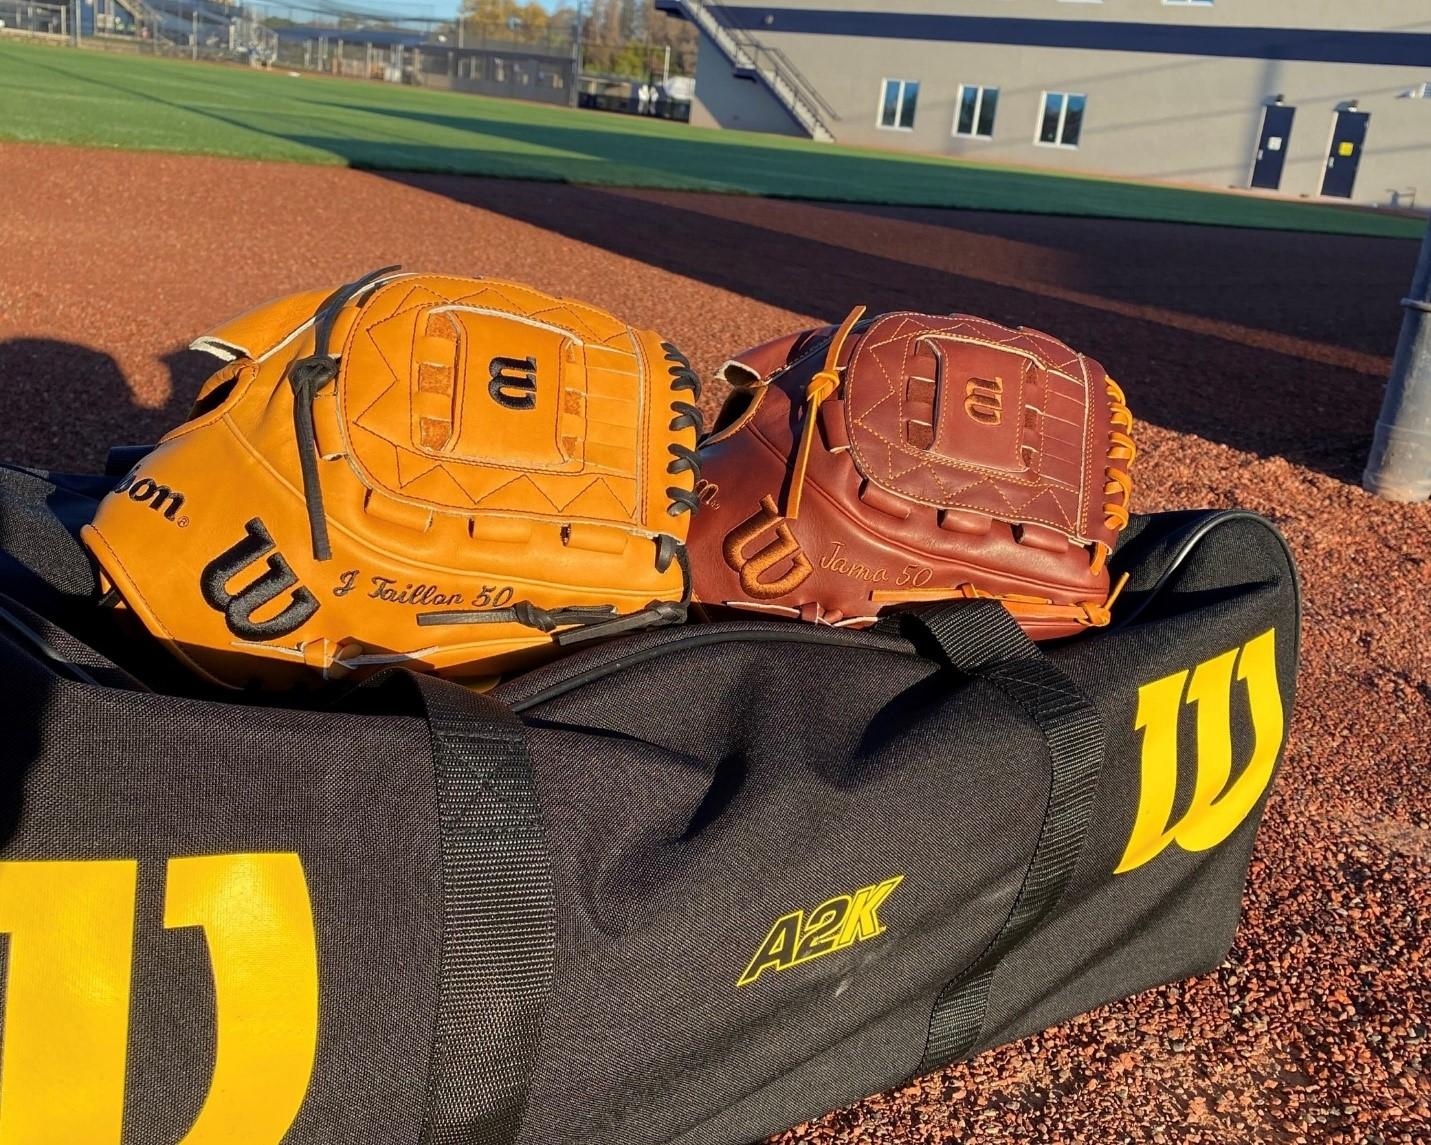 wilson game model ball gloves on a duffle bag